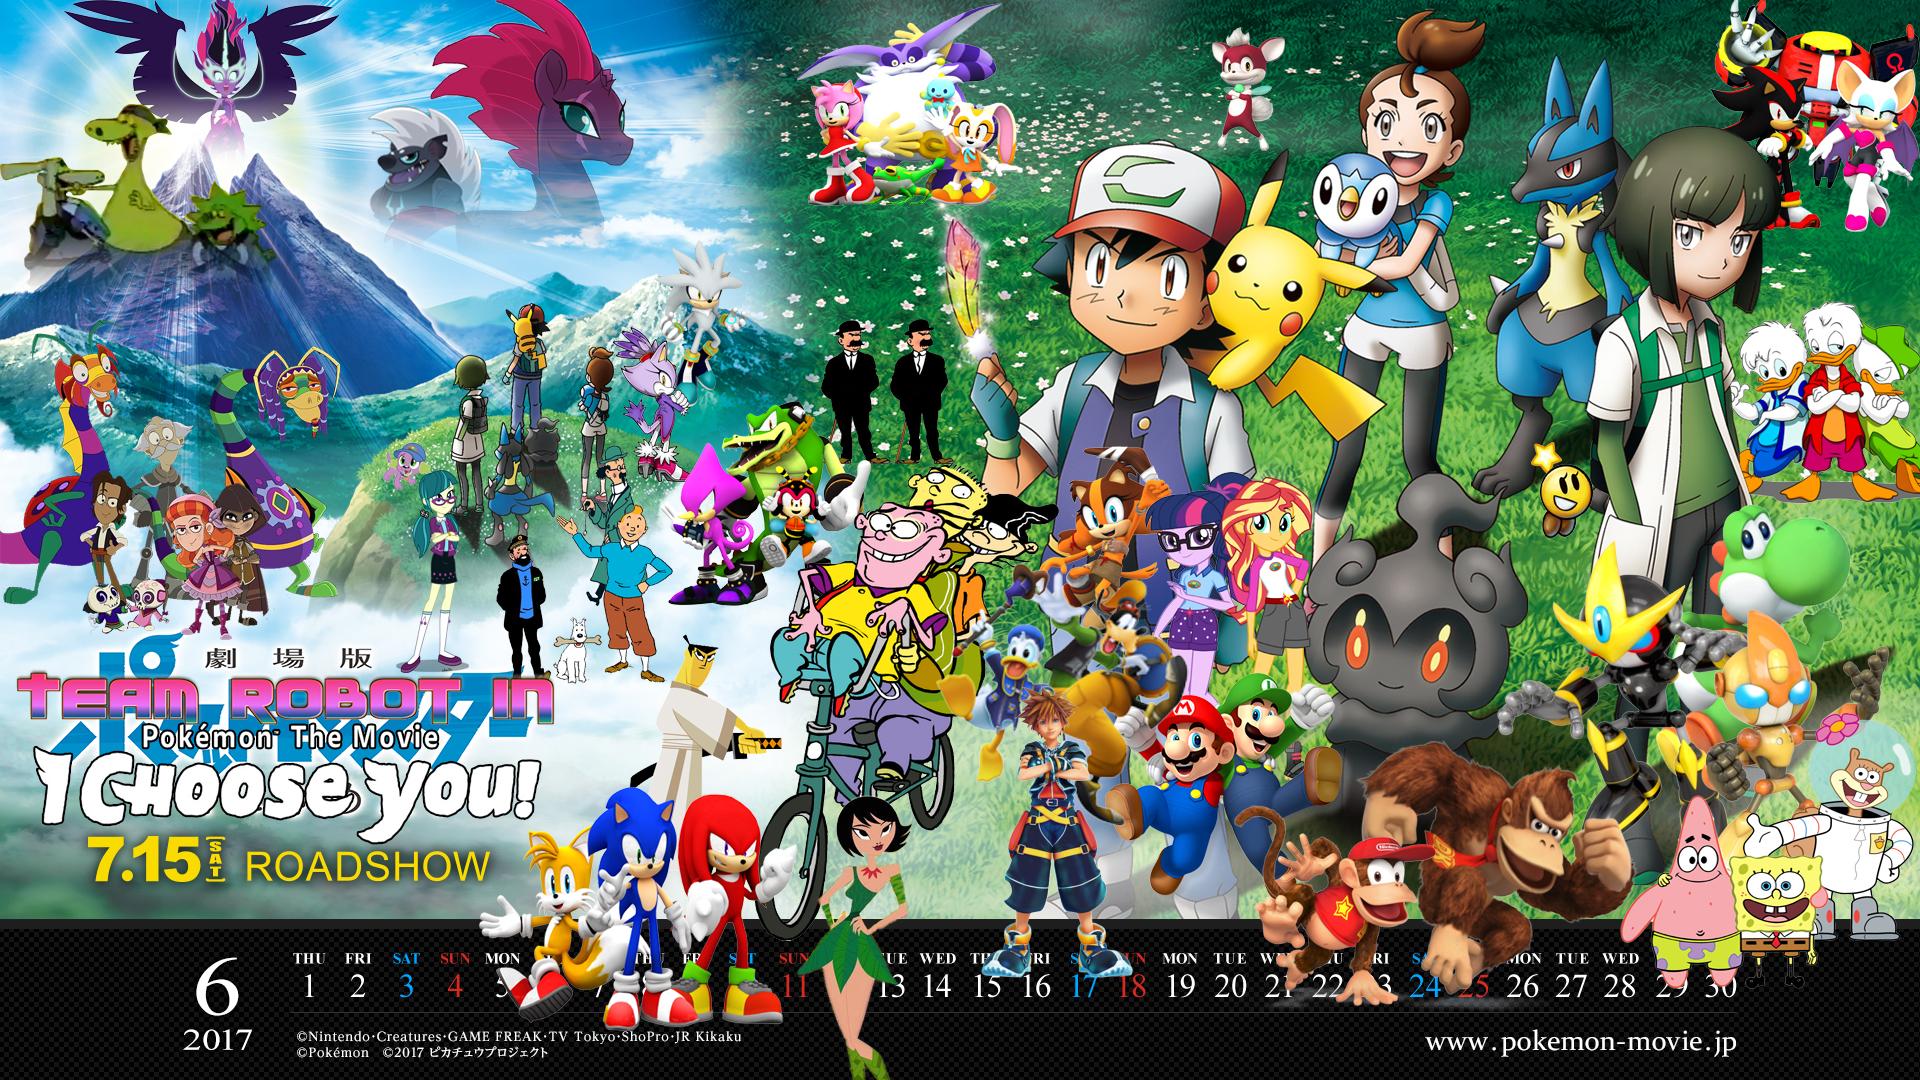 Team Robot In Pokemon Movie I Choose You Pooh S Adventures Wiki Fandom